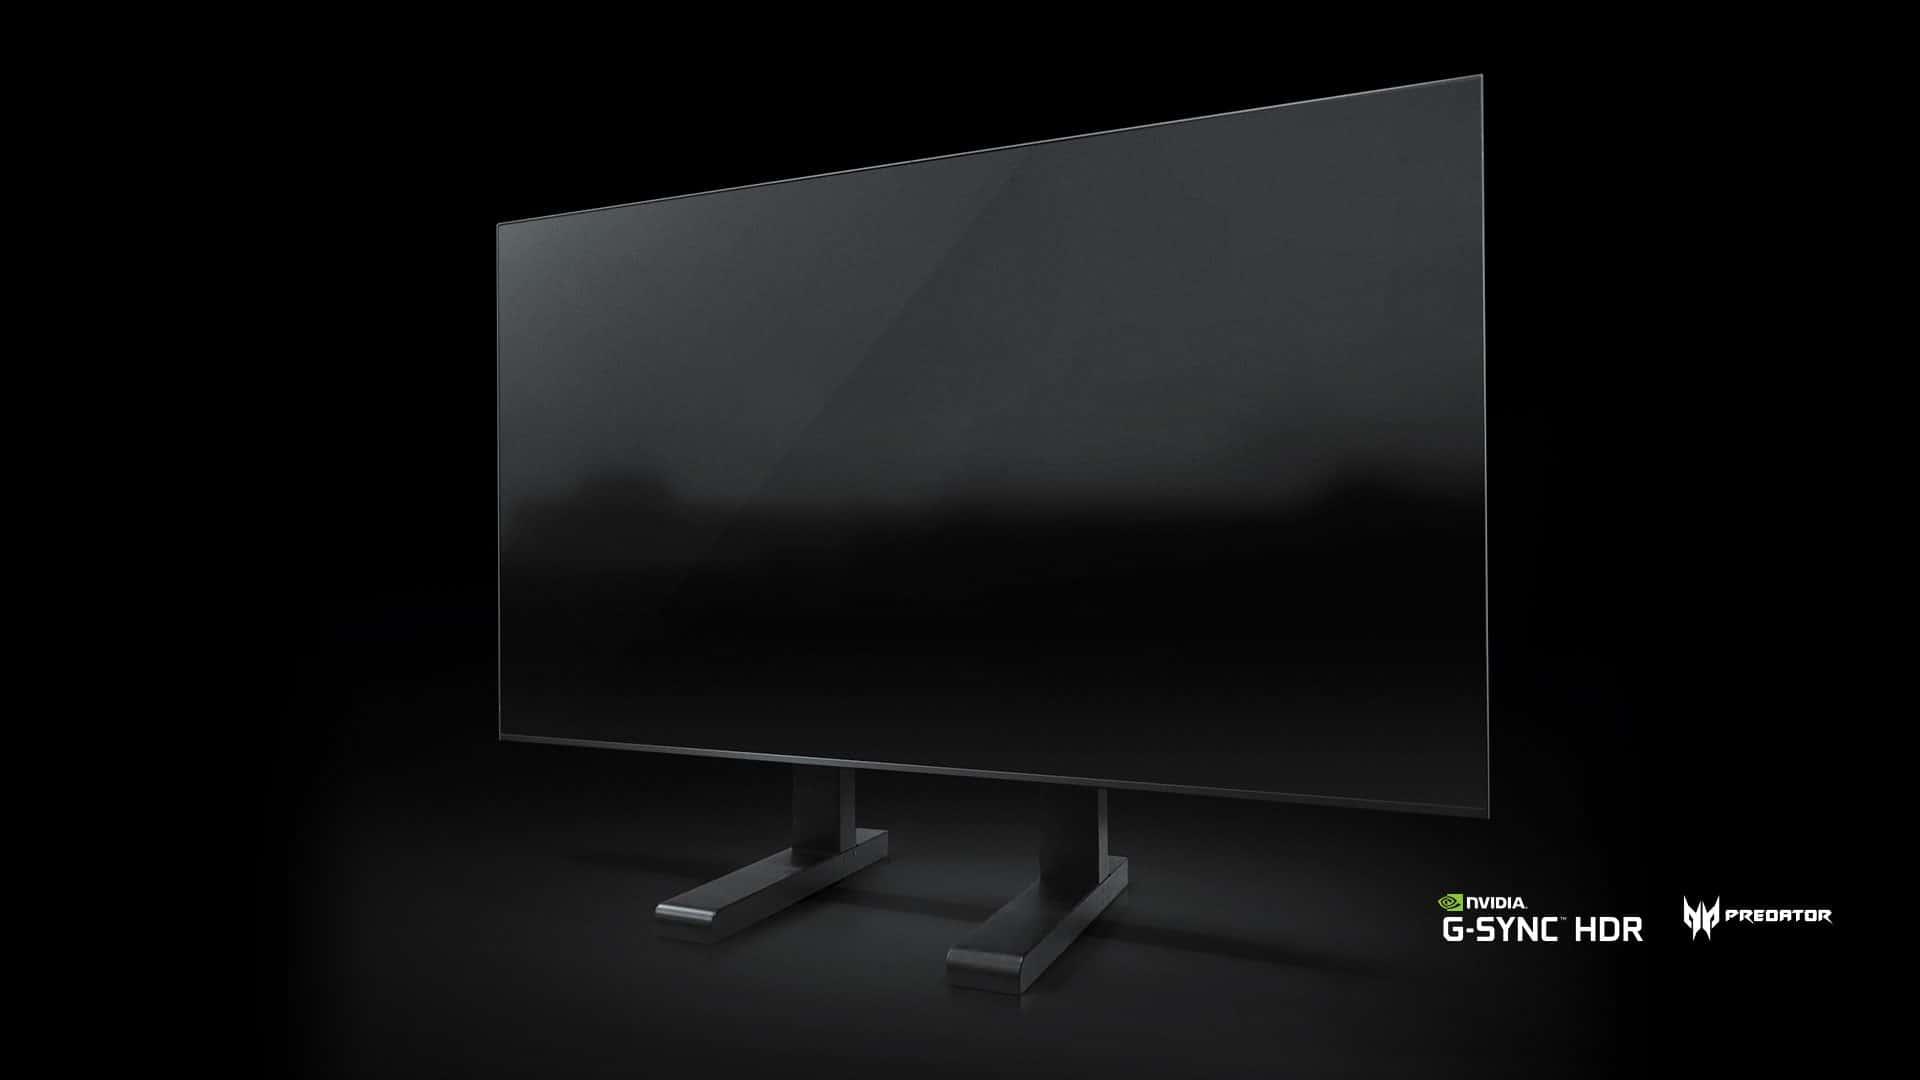 Velkoformátový herní monitor Predator s NVIDIA G-SYNC